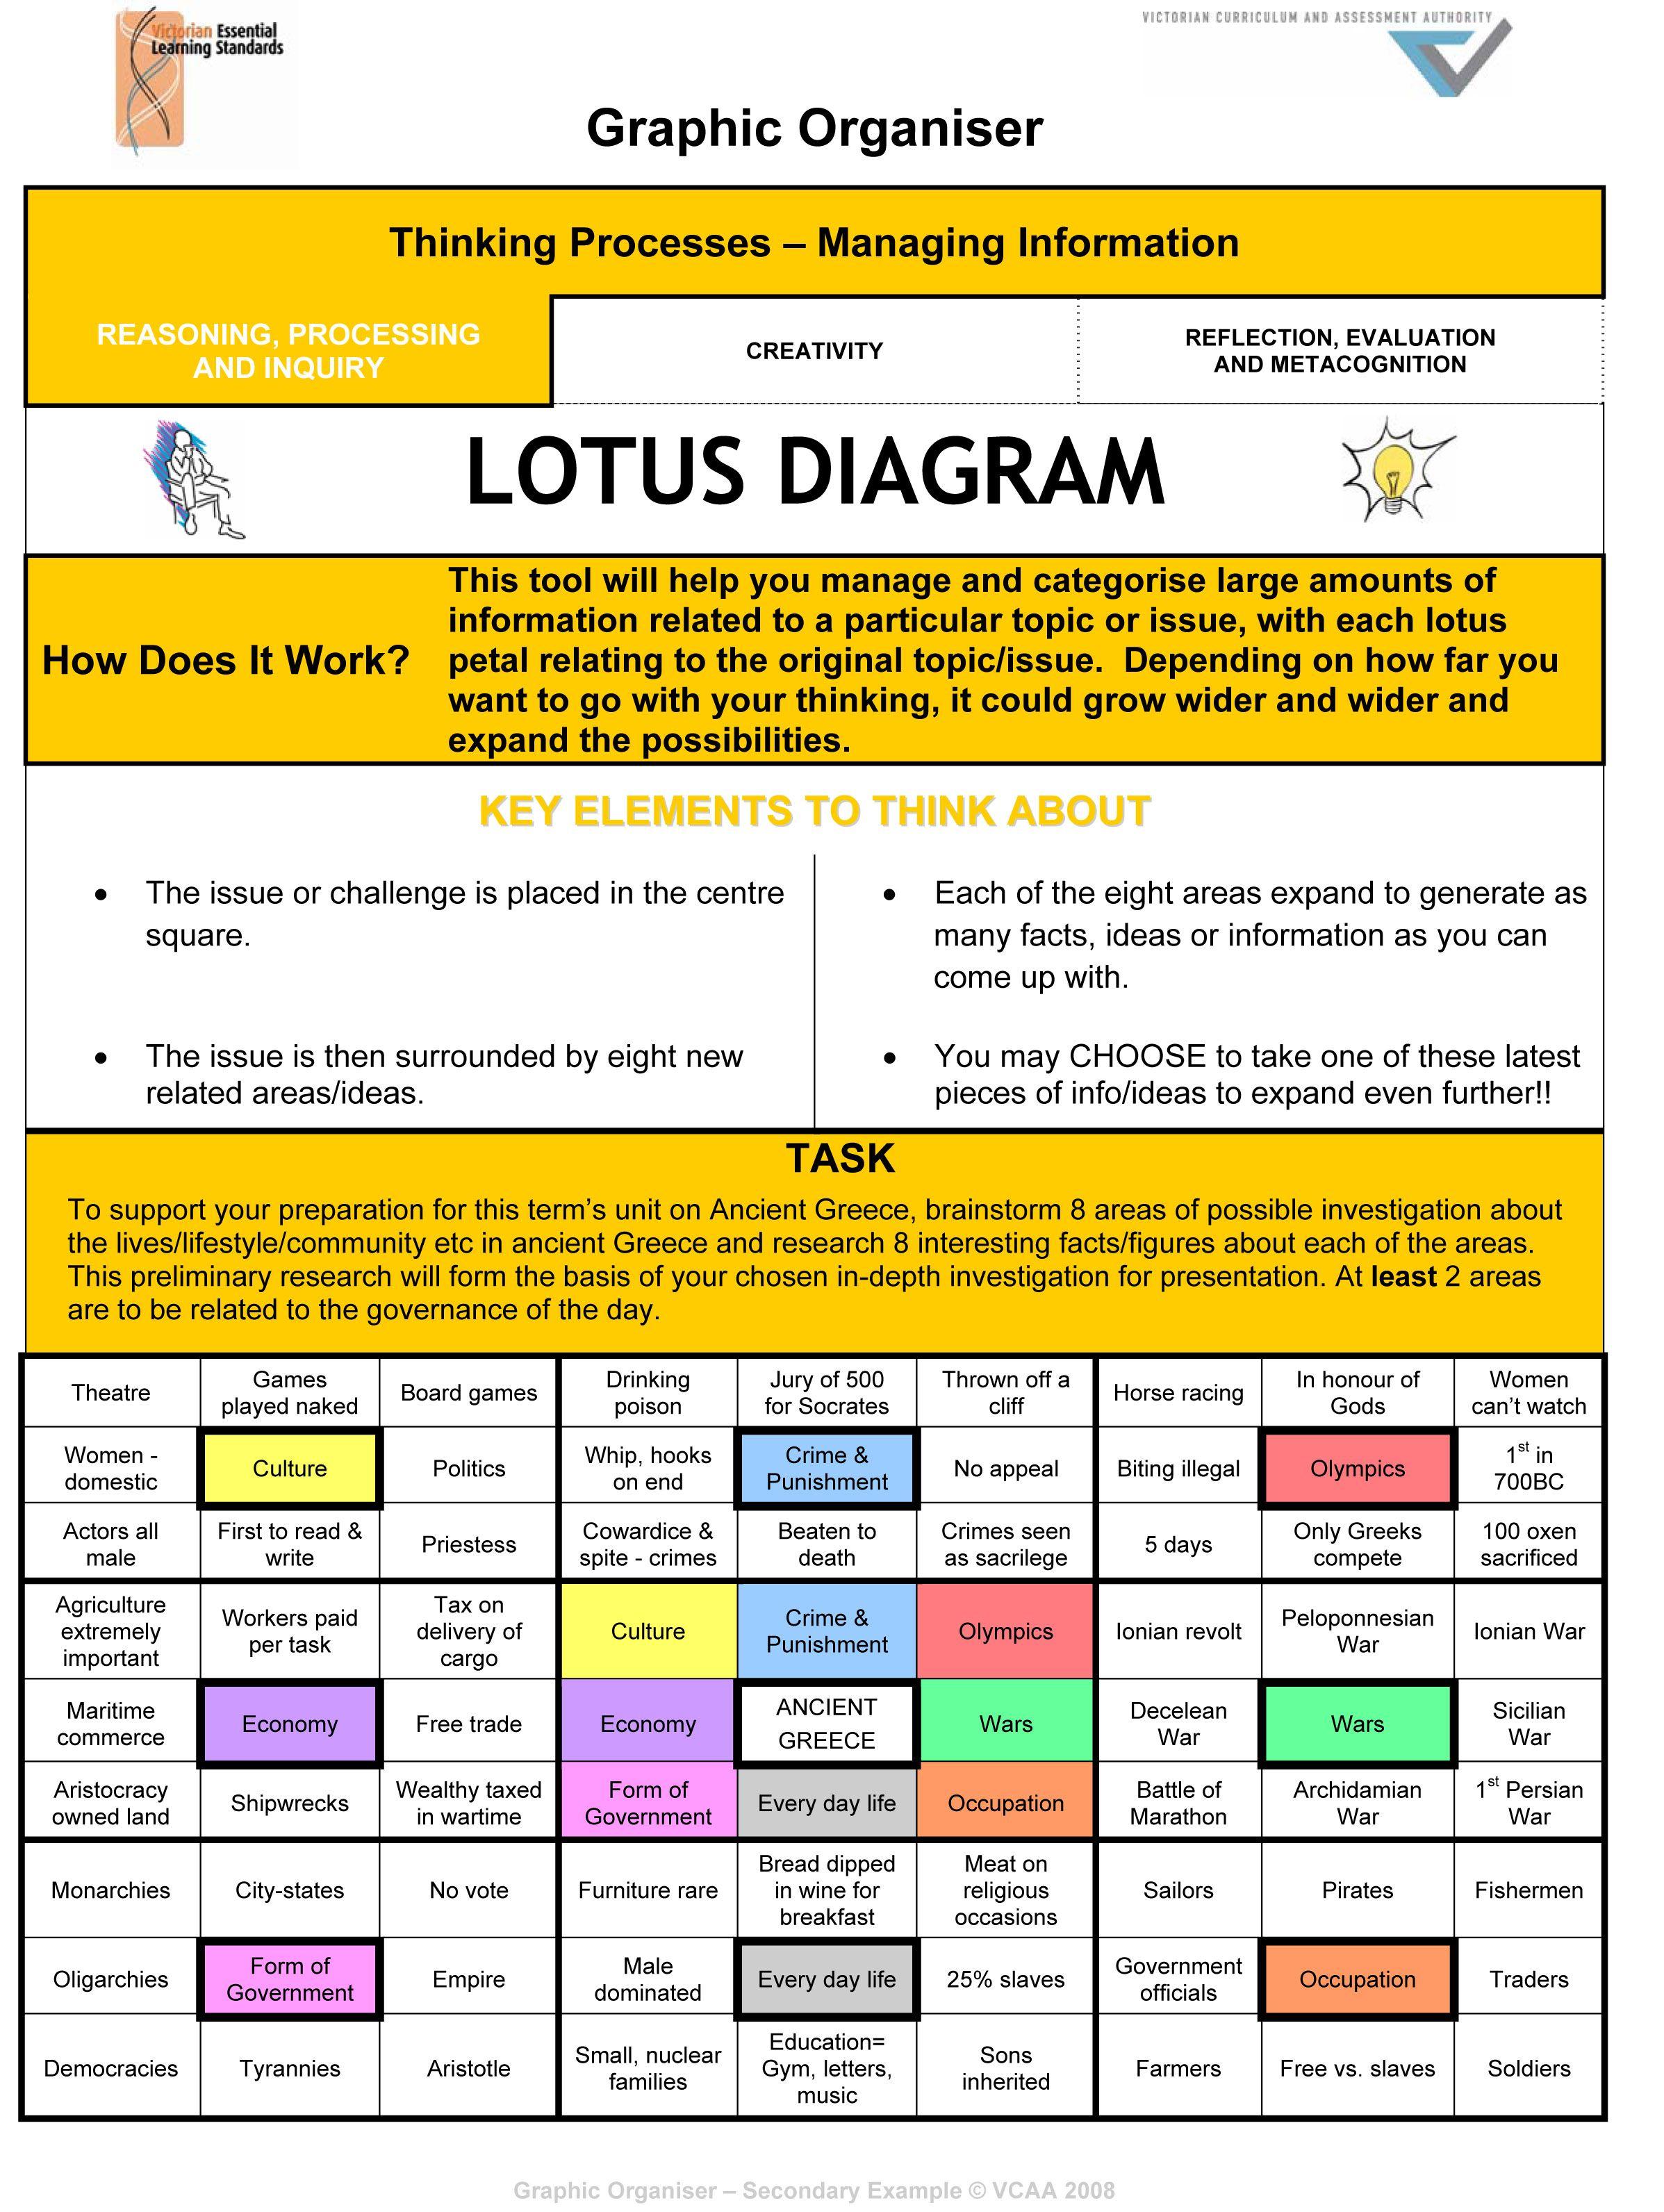 lotus_digram_exampleGraphicOrganiser LOTUS DIAGRAM What